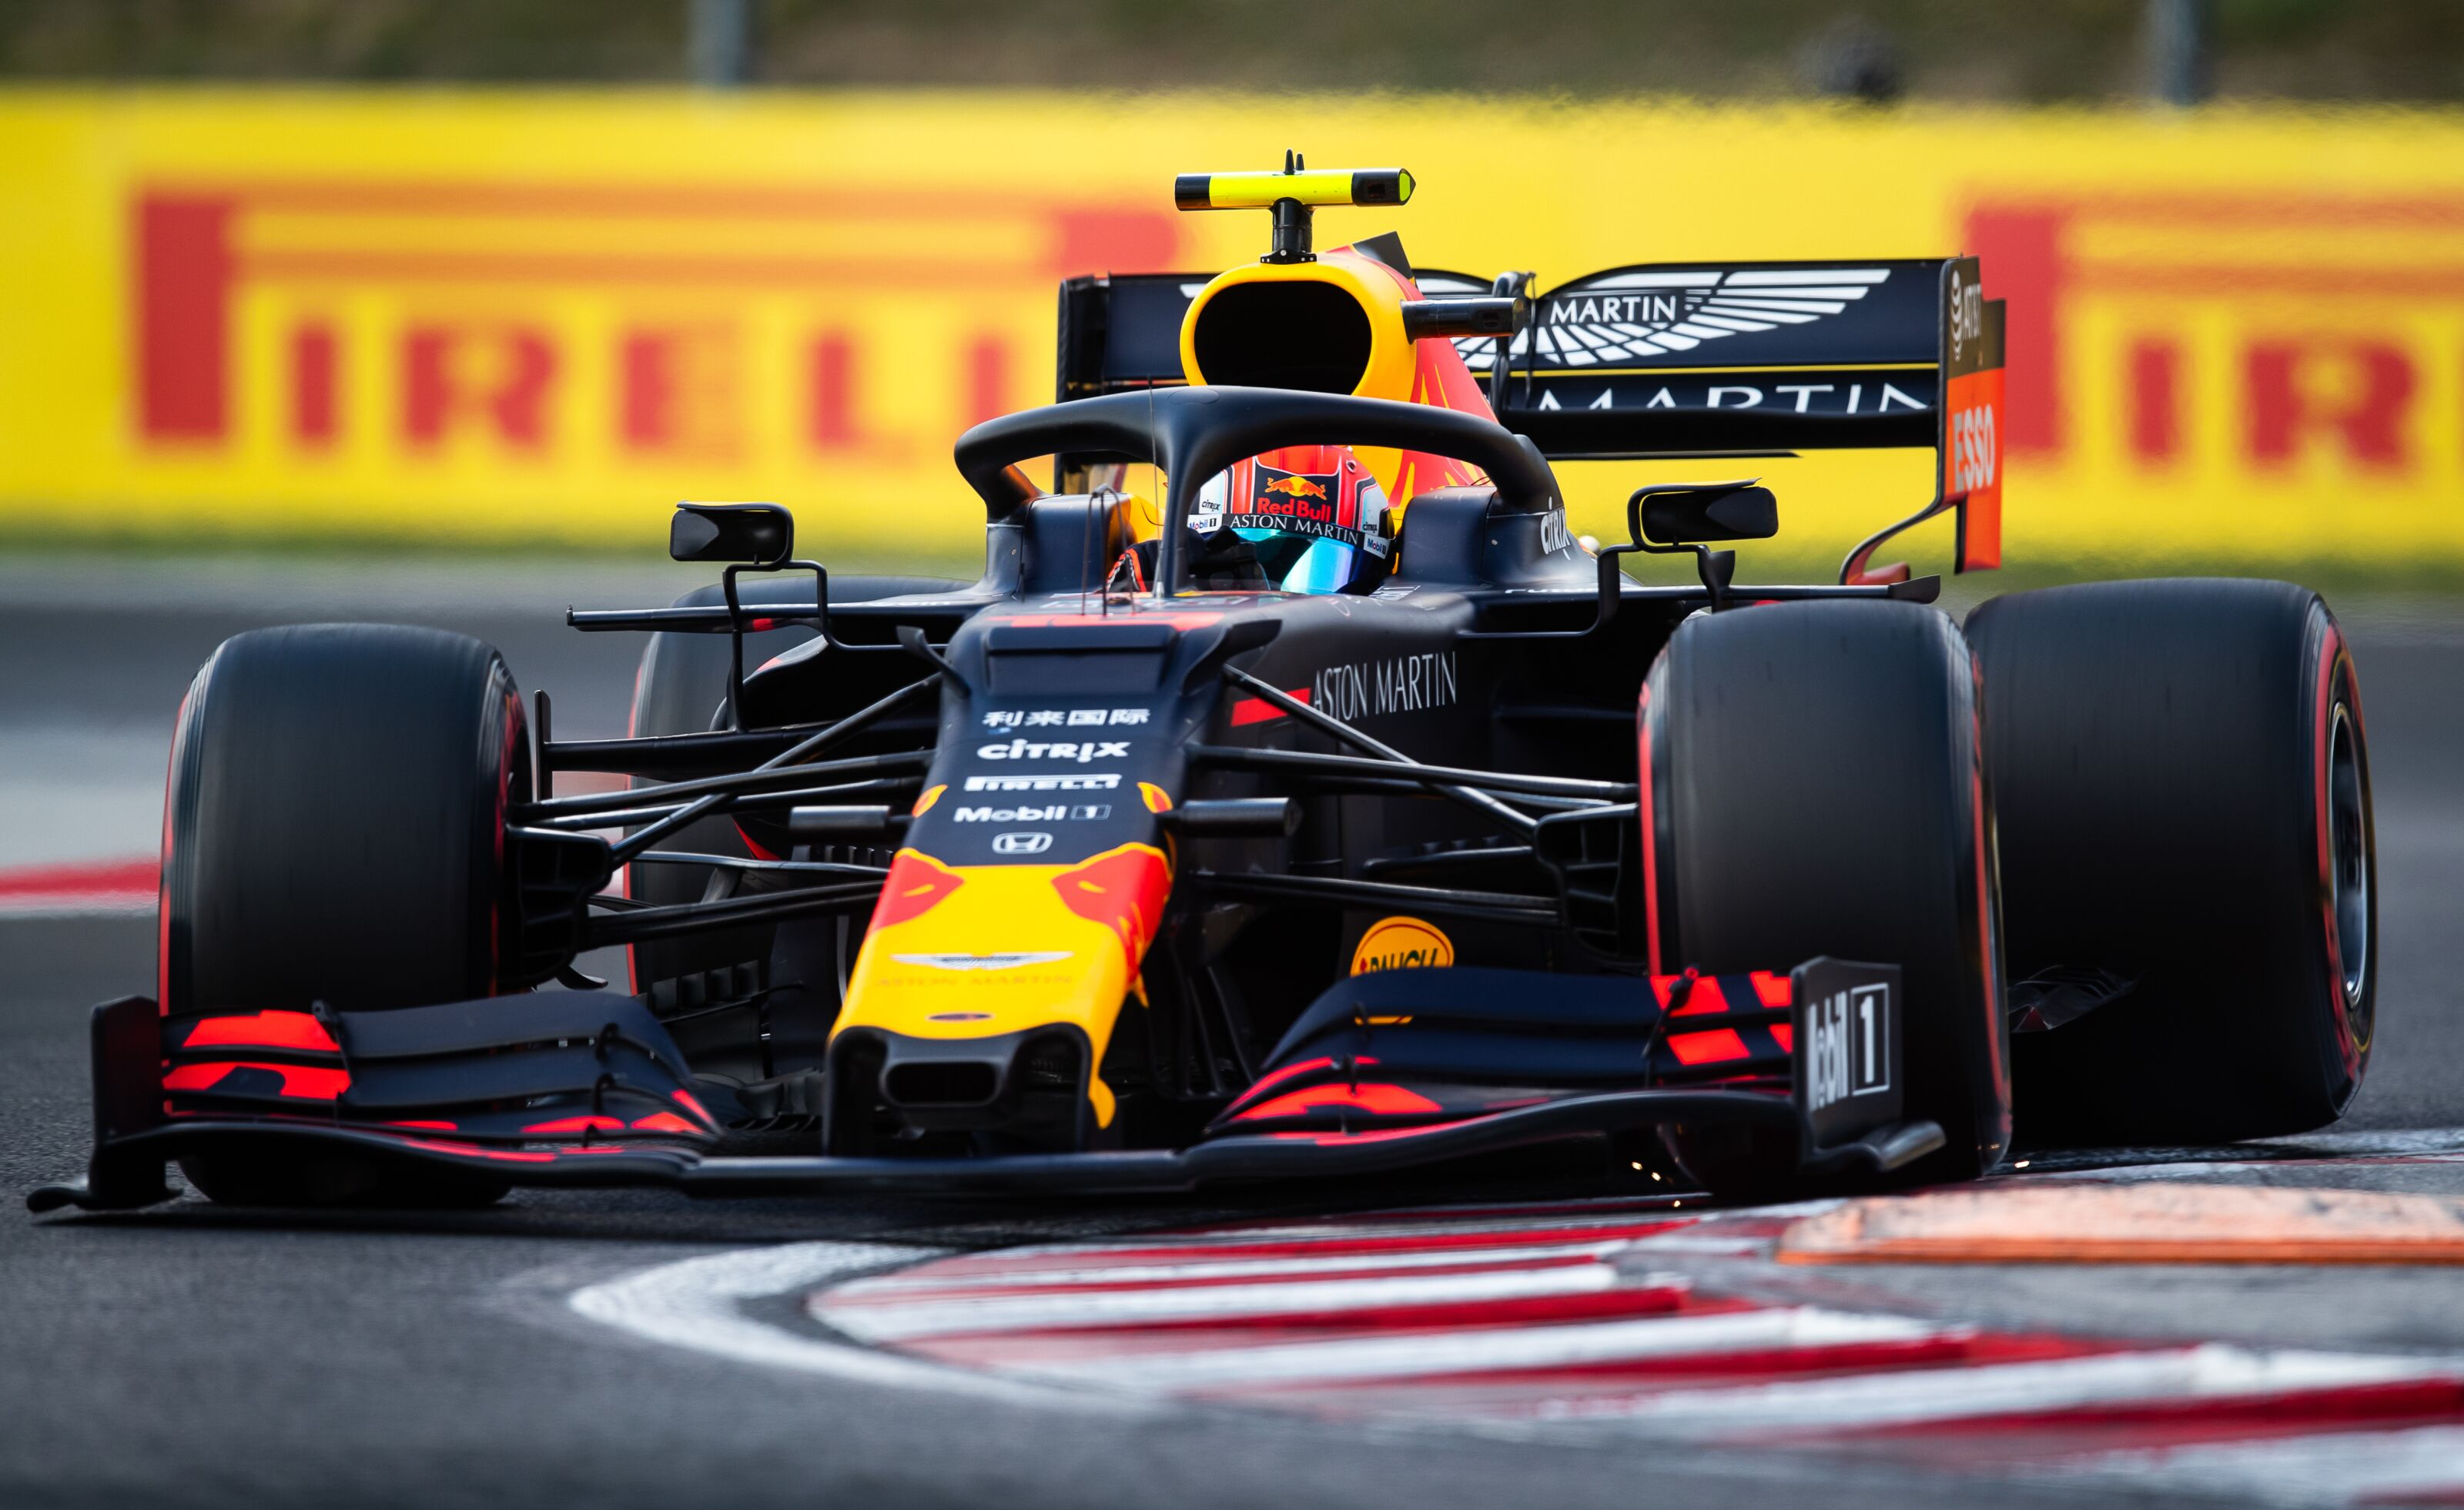 Formula 1: 2019 a major season of resurgence for Honda